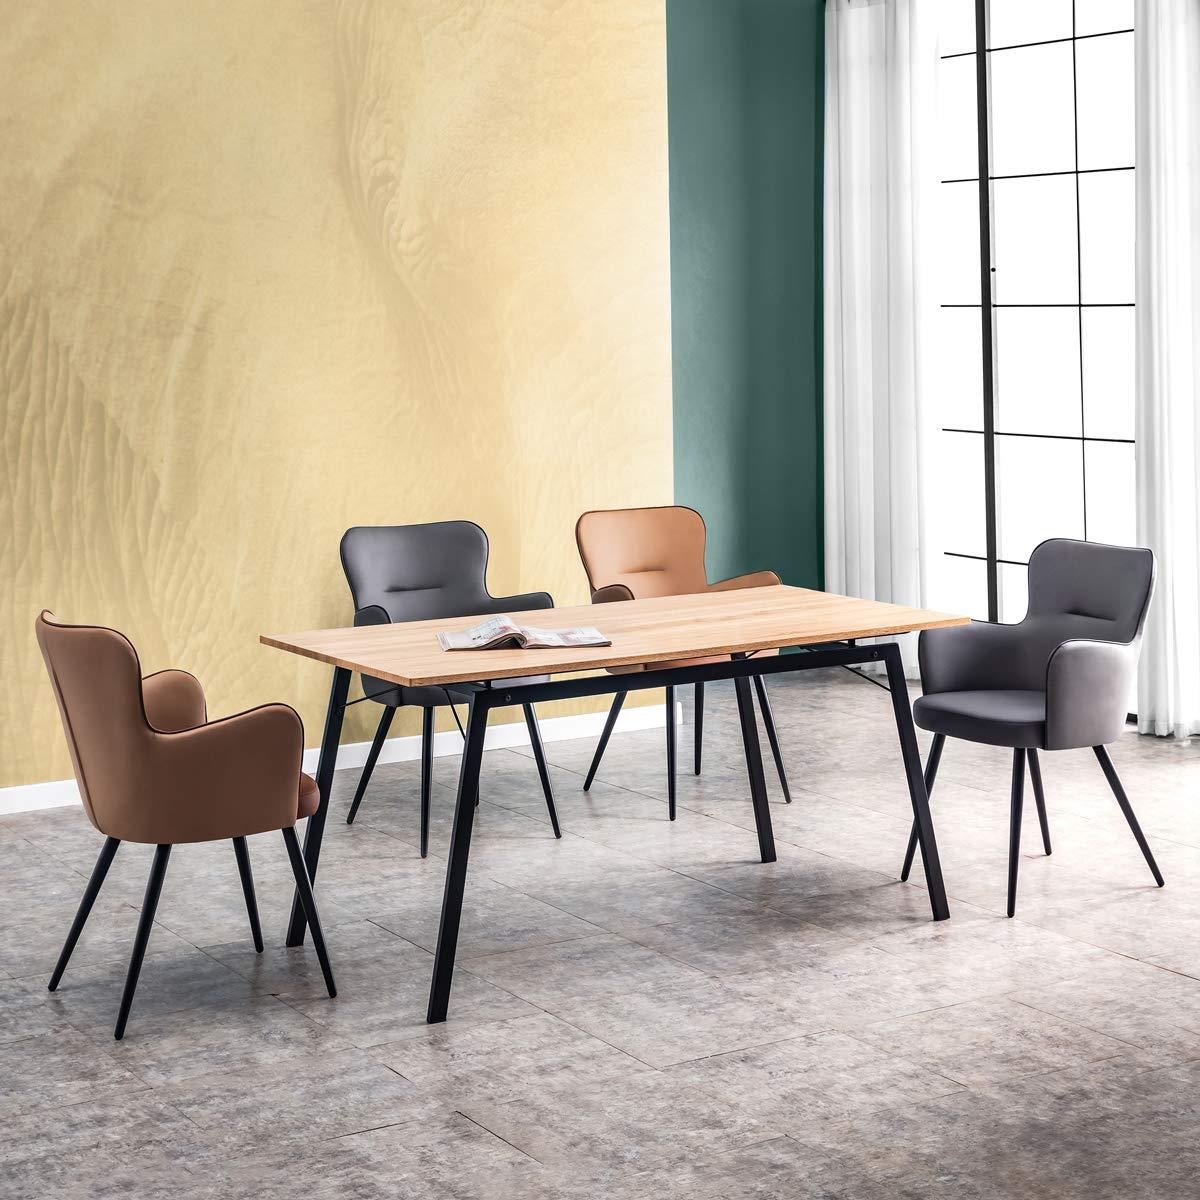 Mc Haus Poltrona Elephant sedia  design sala da pranzo,Grigia Safari  53x45x89cm